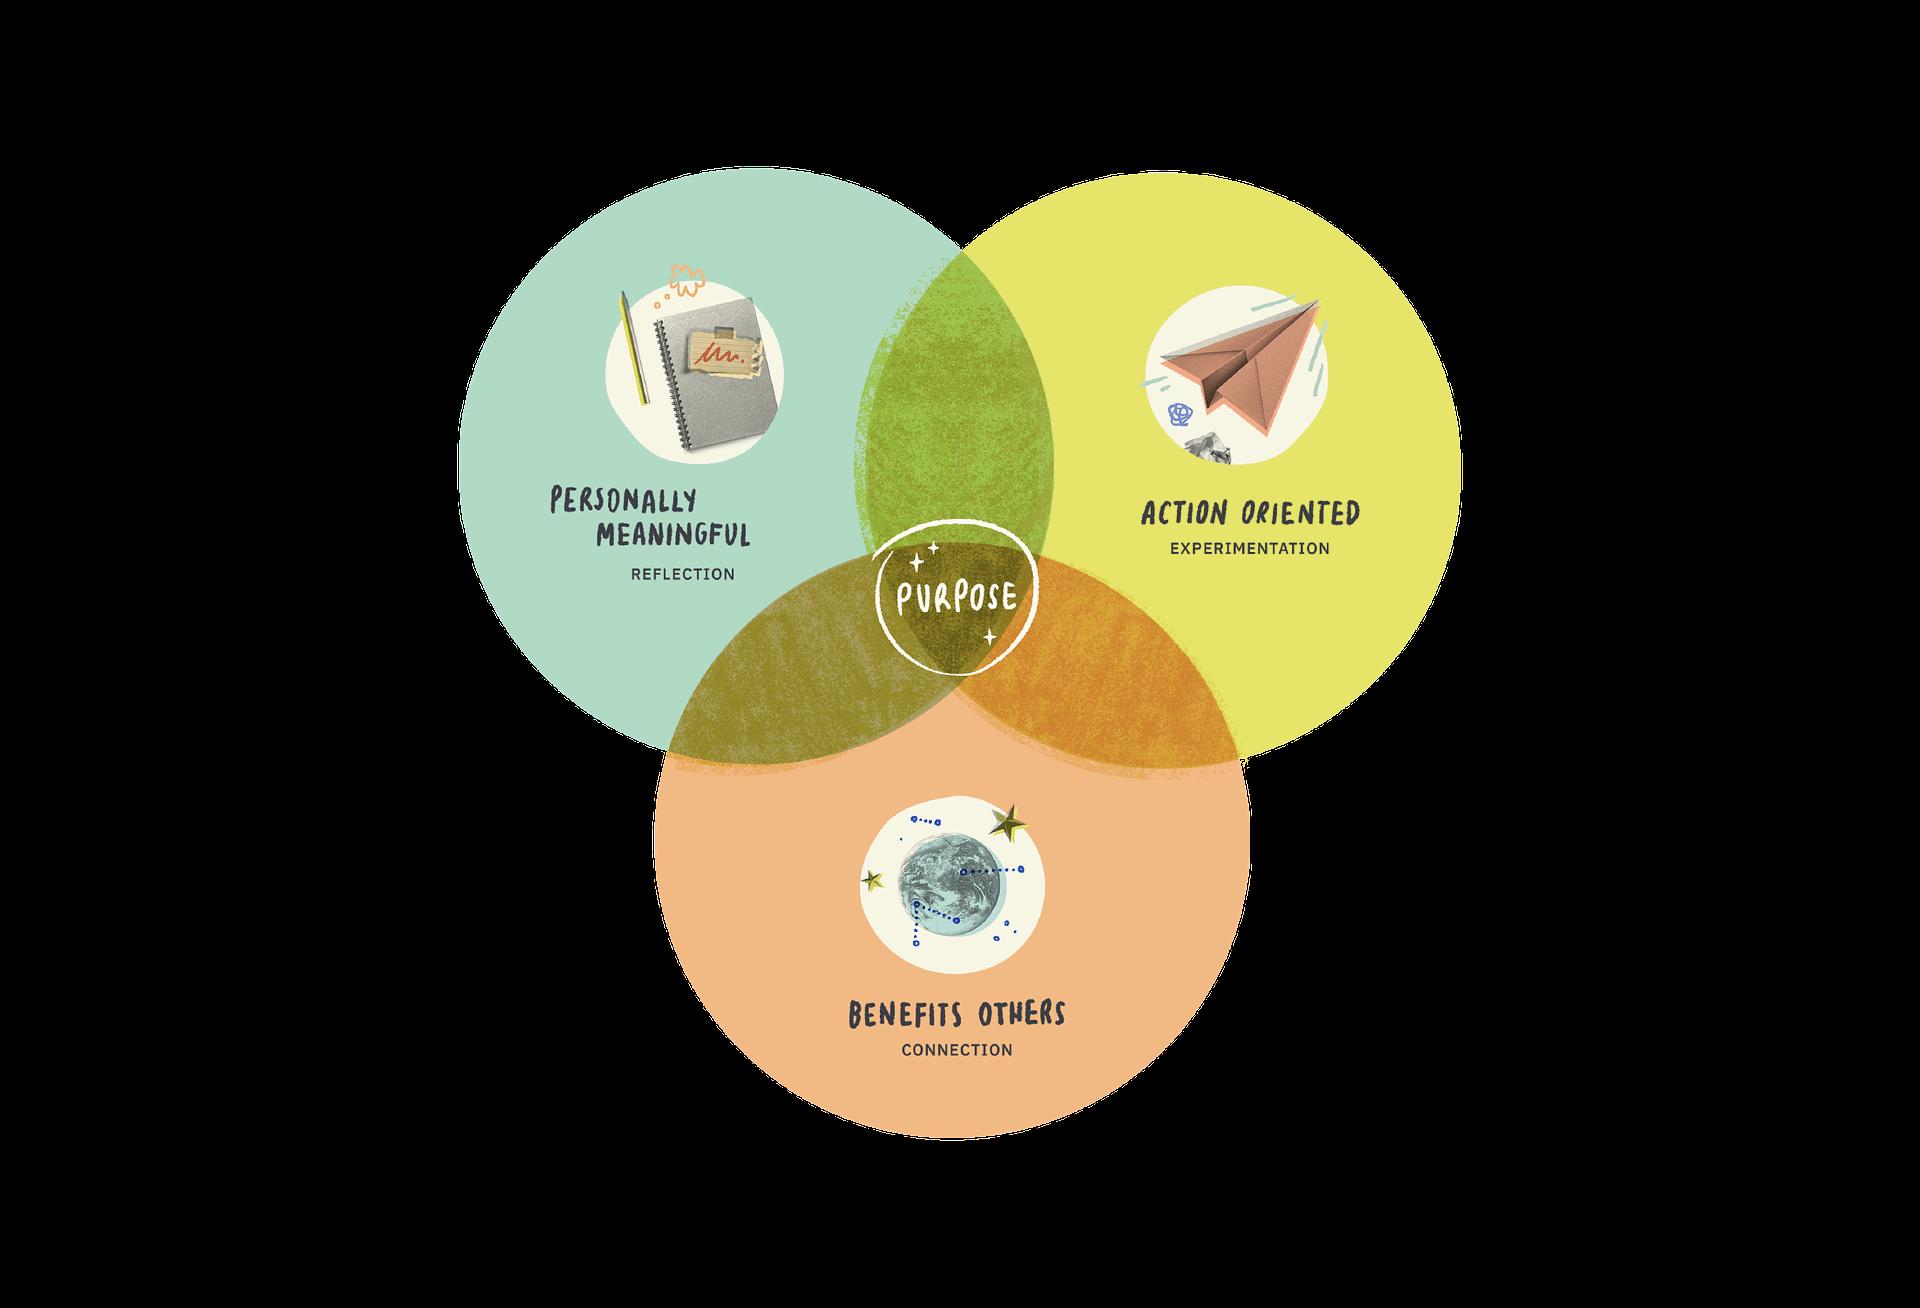 The purpose framework